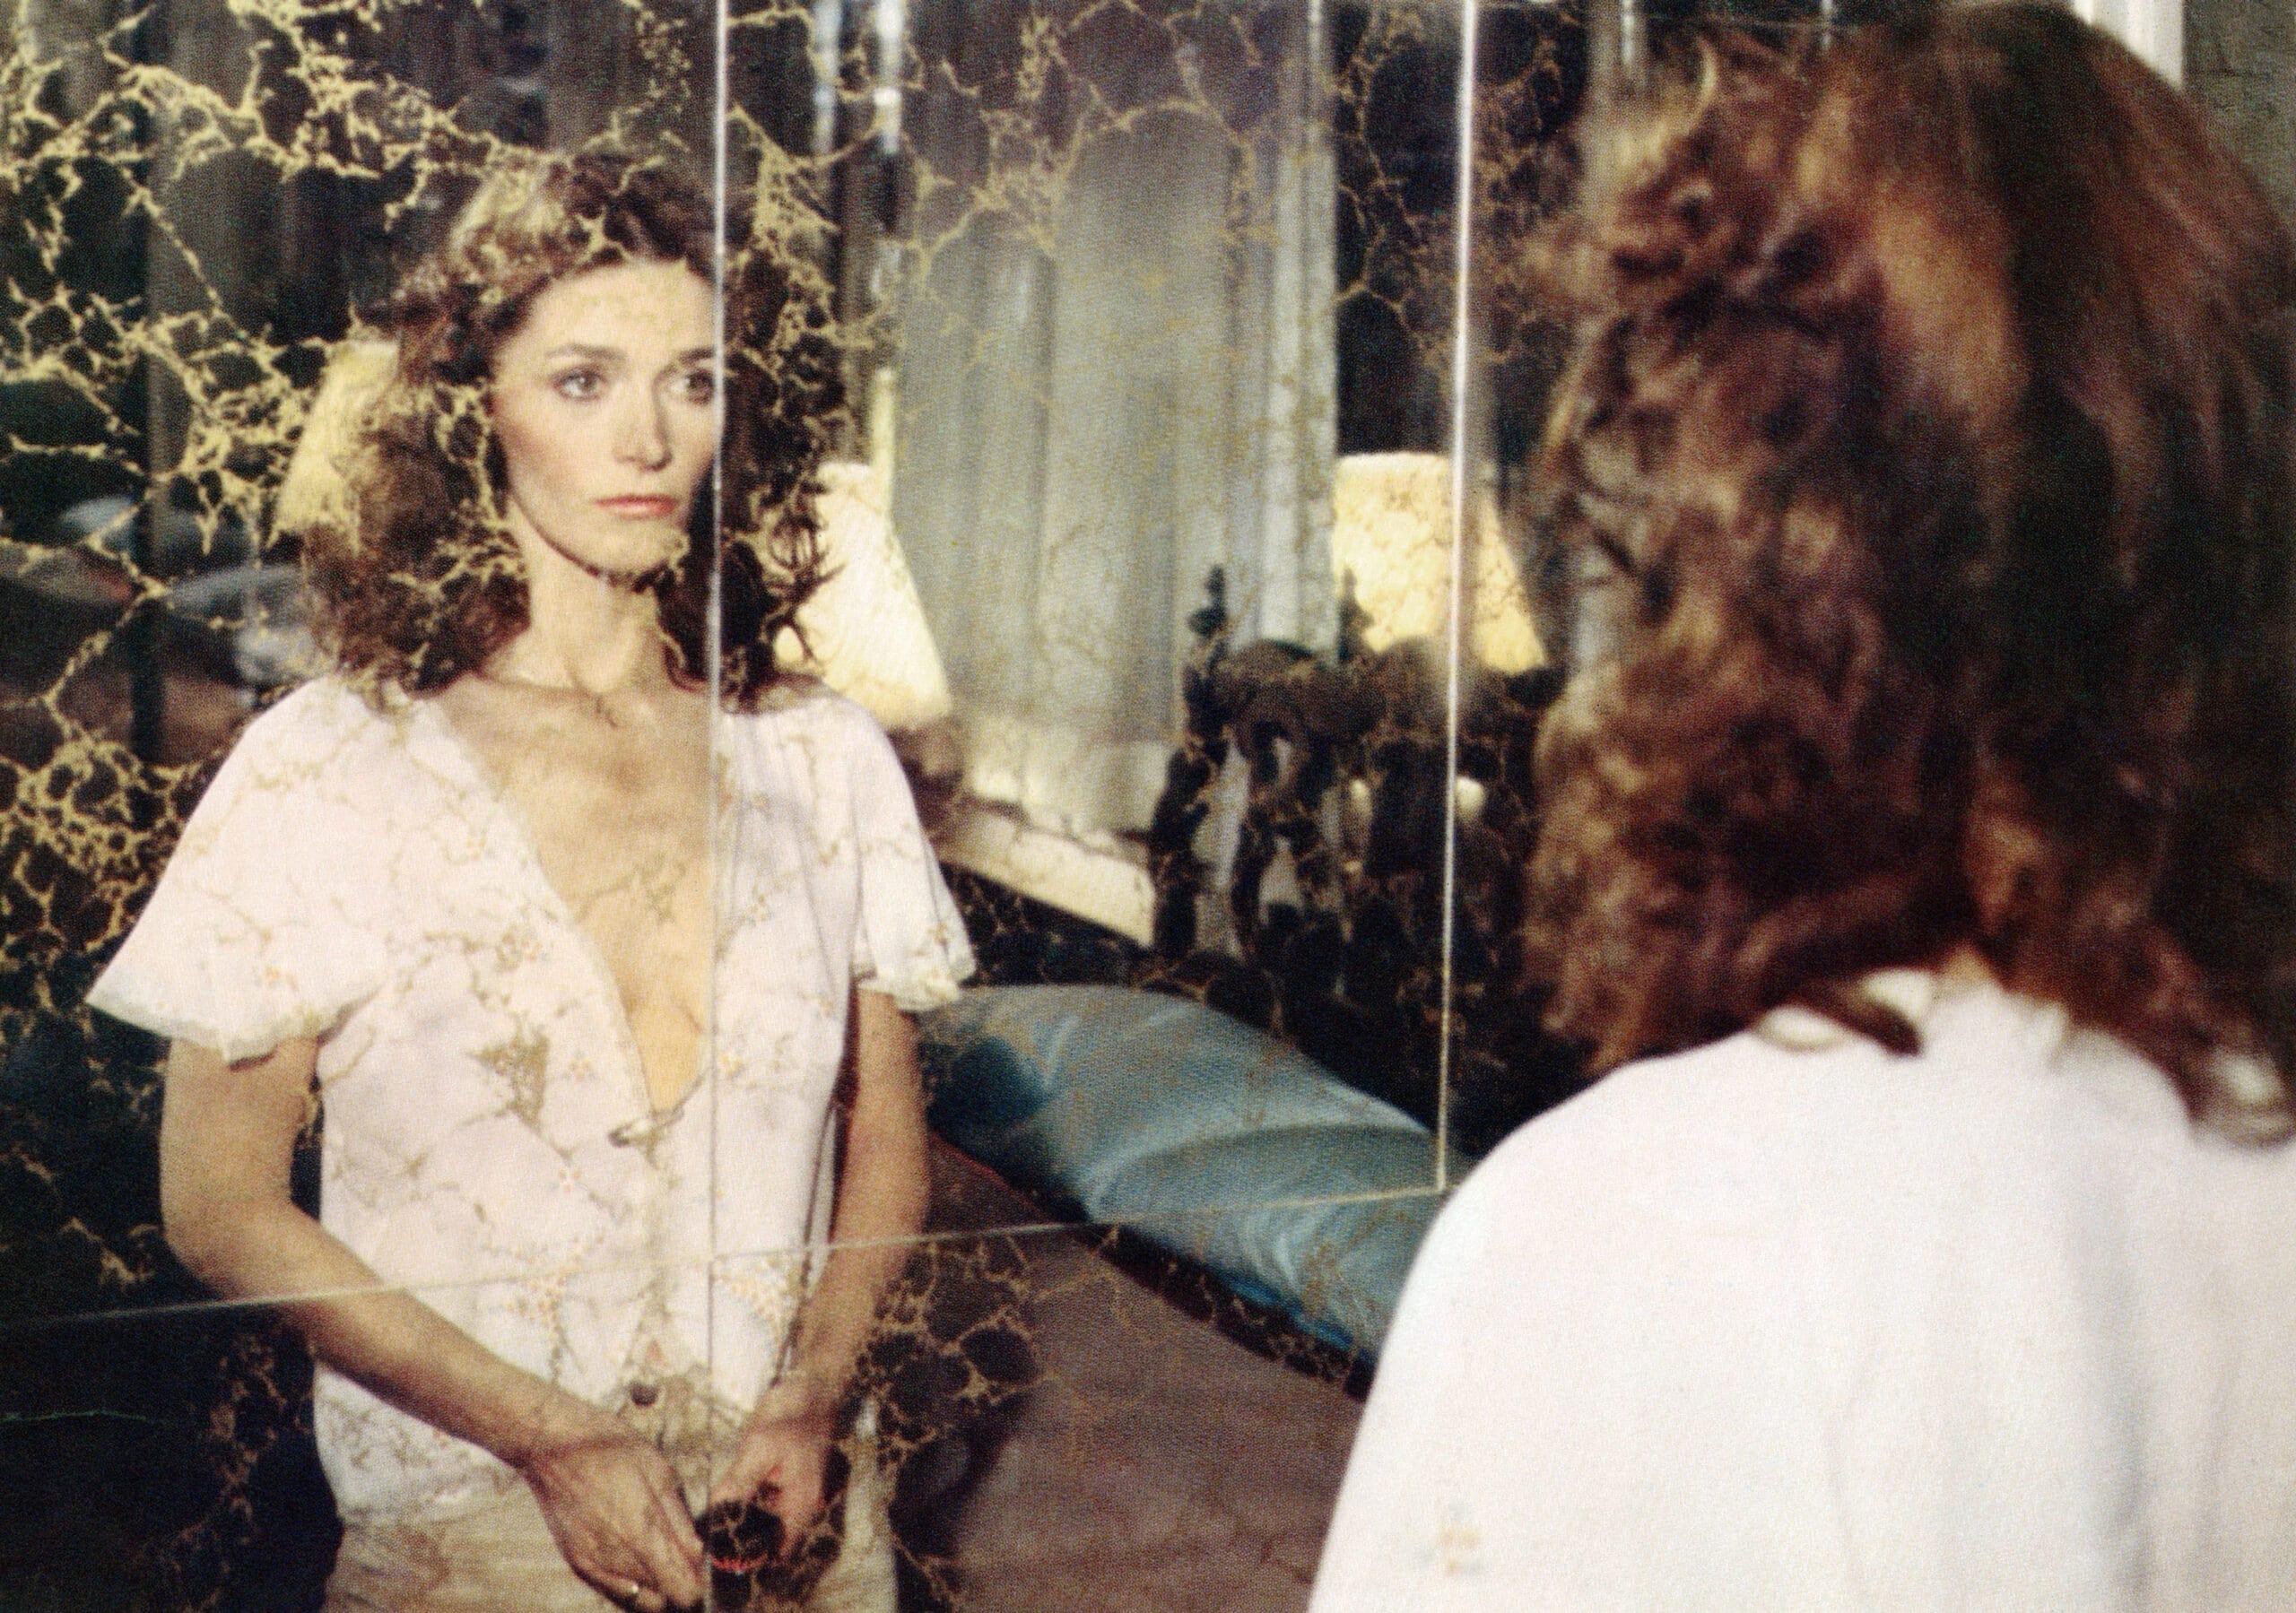 'THE AMITYVILLE HORROR,' Margot Kidder